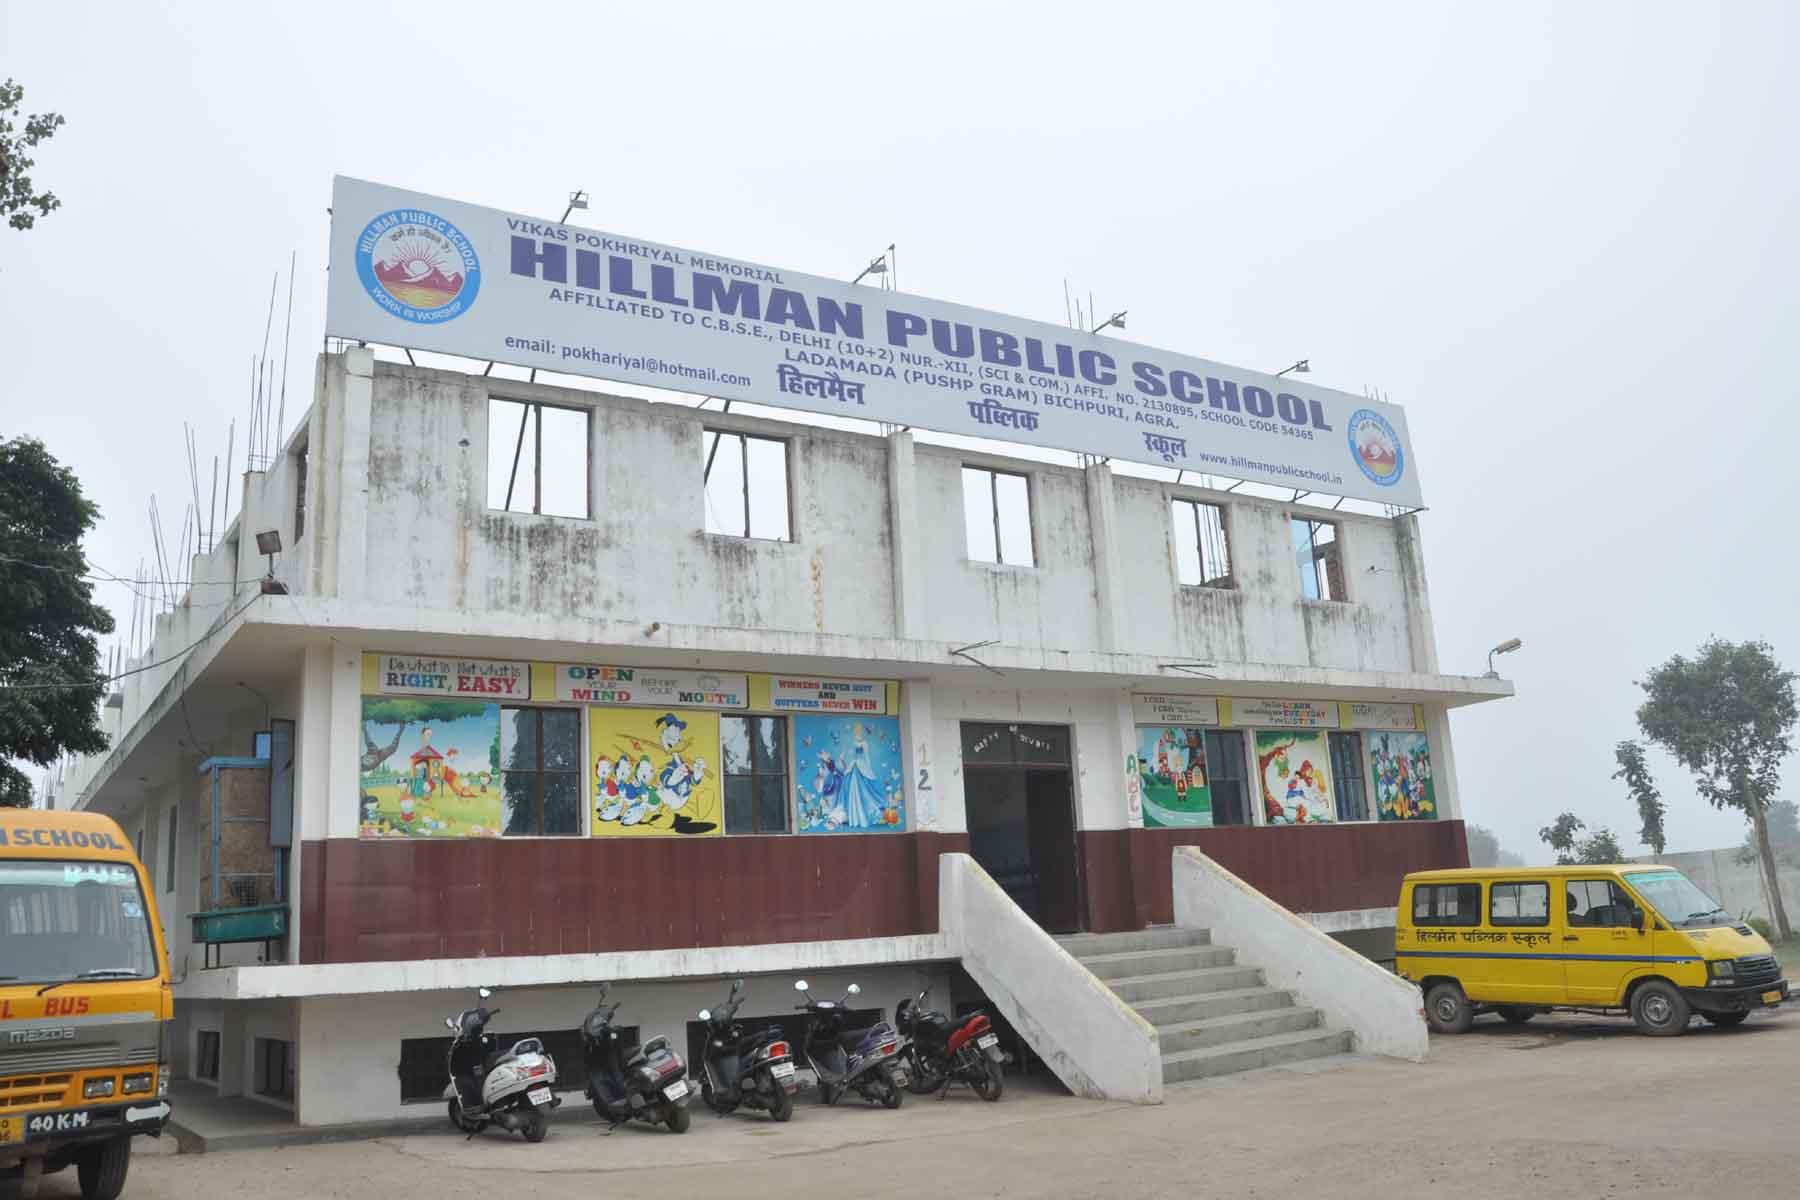 HILLMAN PUBLIC SCHOOL LADAMADA 2130895